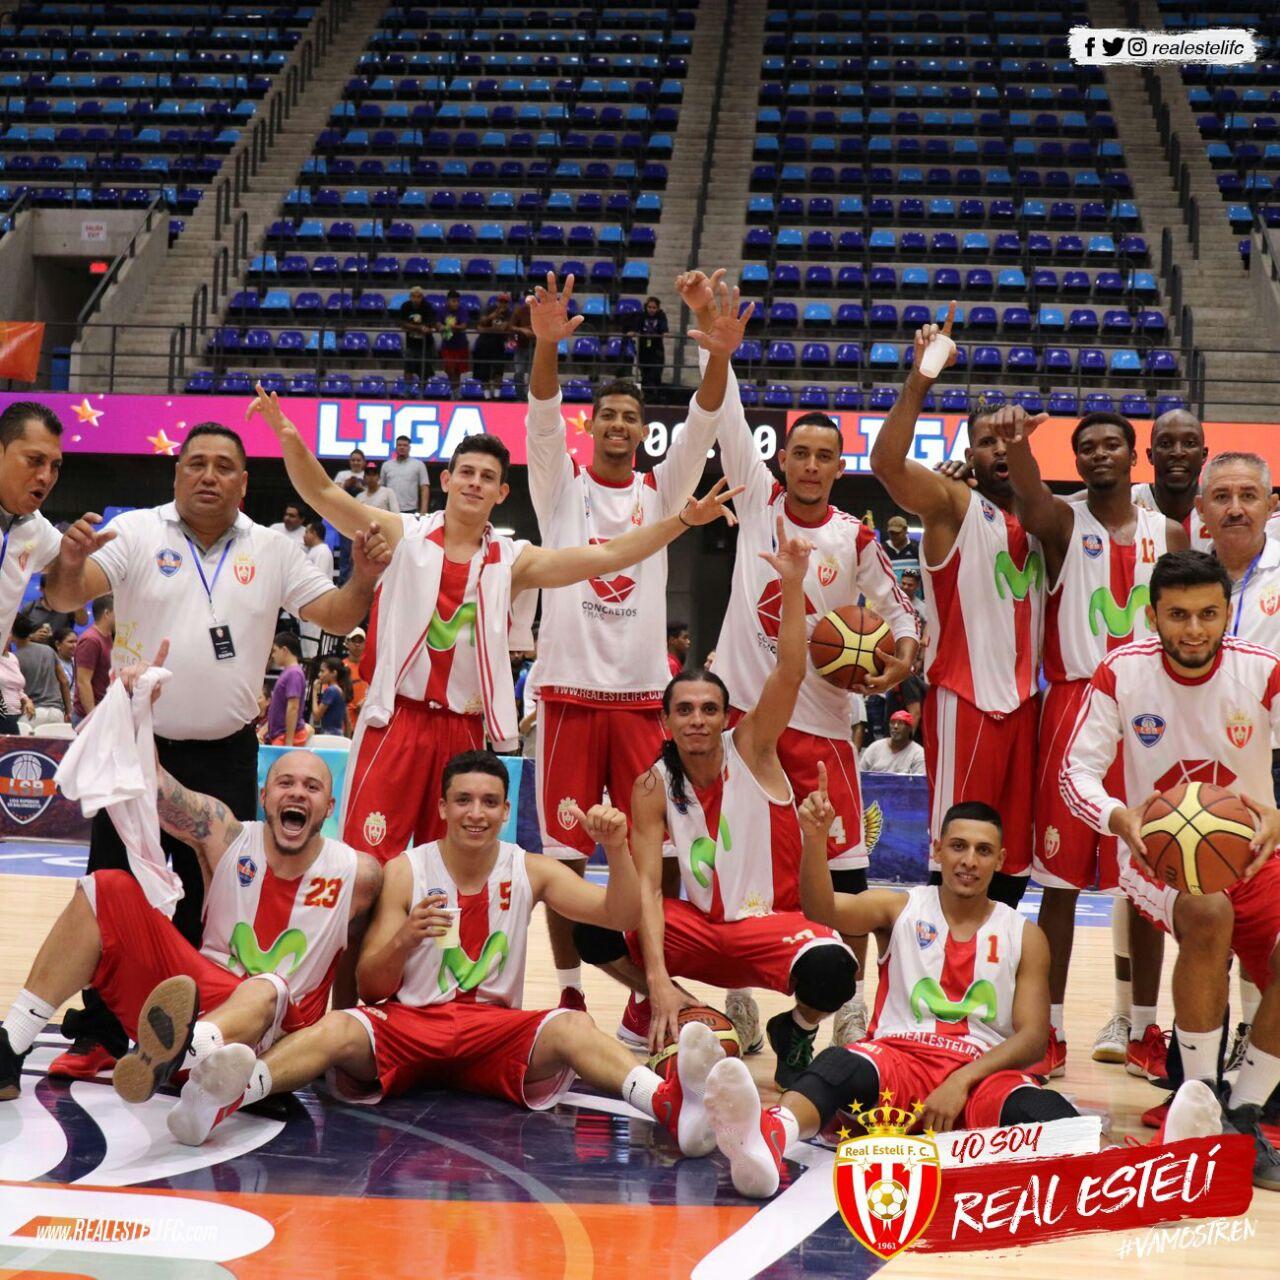 Real Estelí consigue segundo éxito en la Liga Superior de Baloncesto